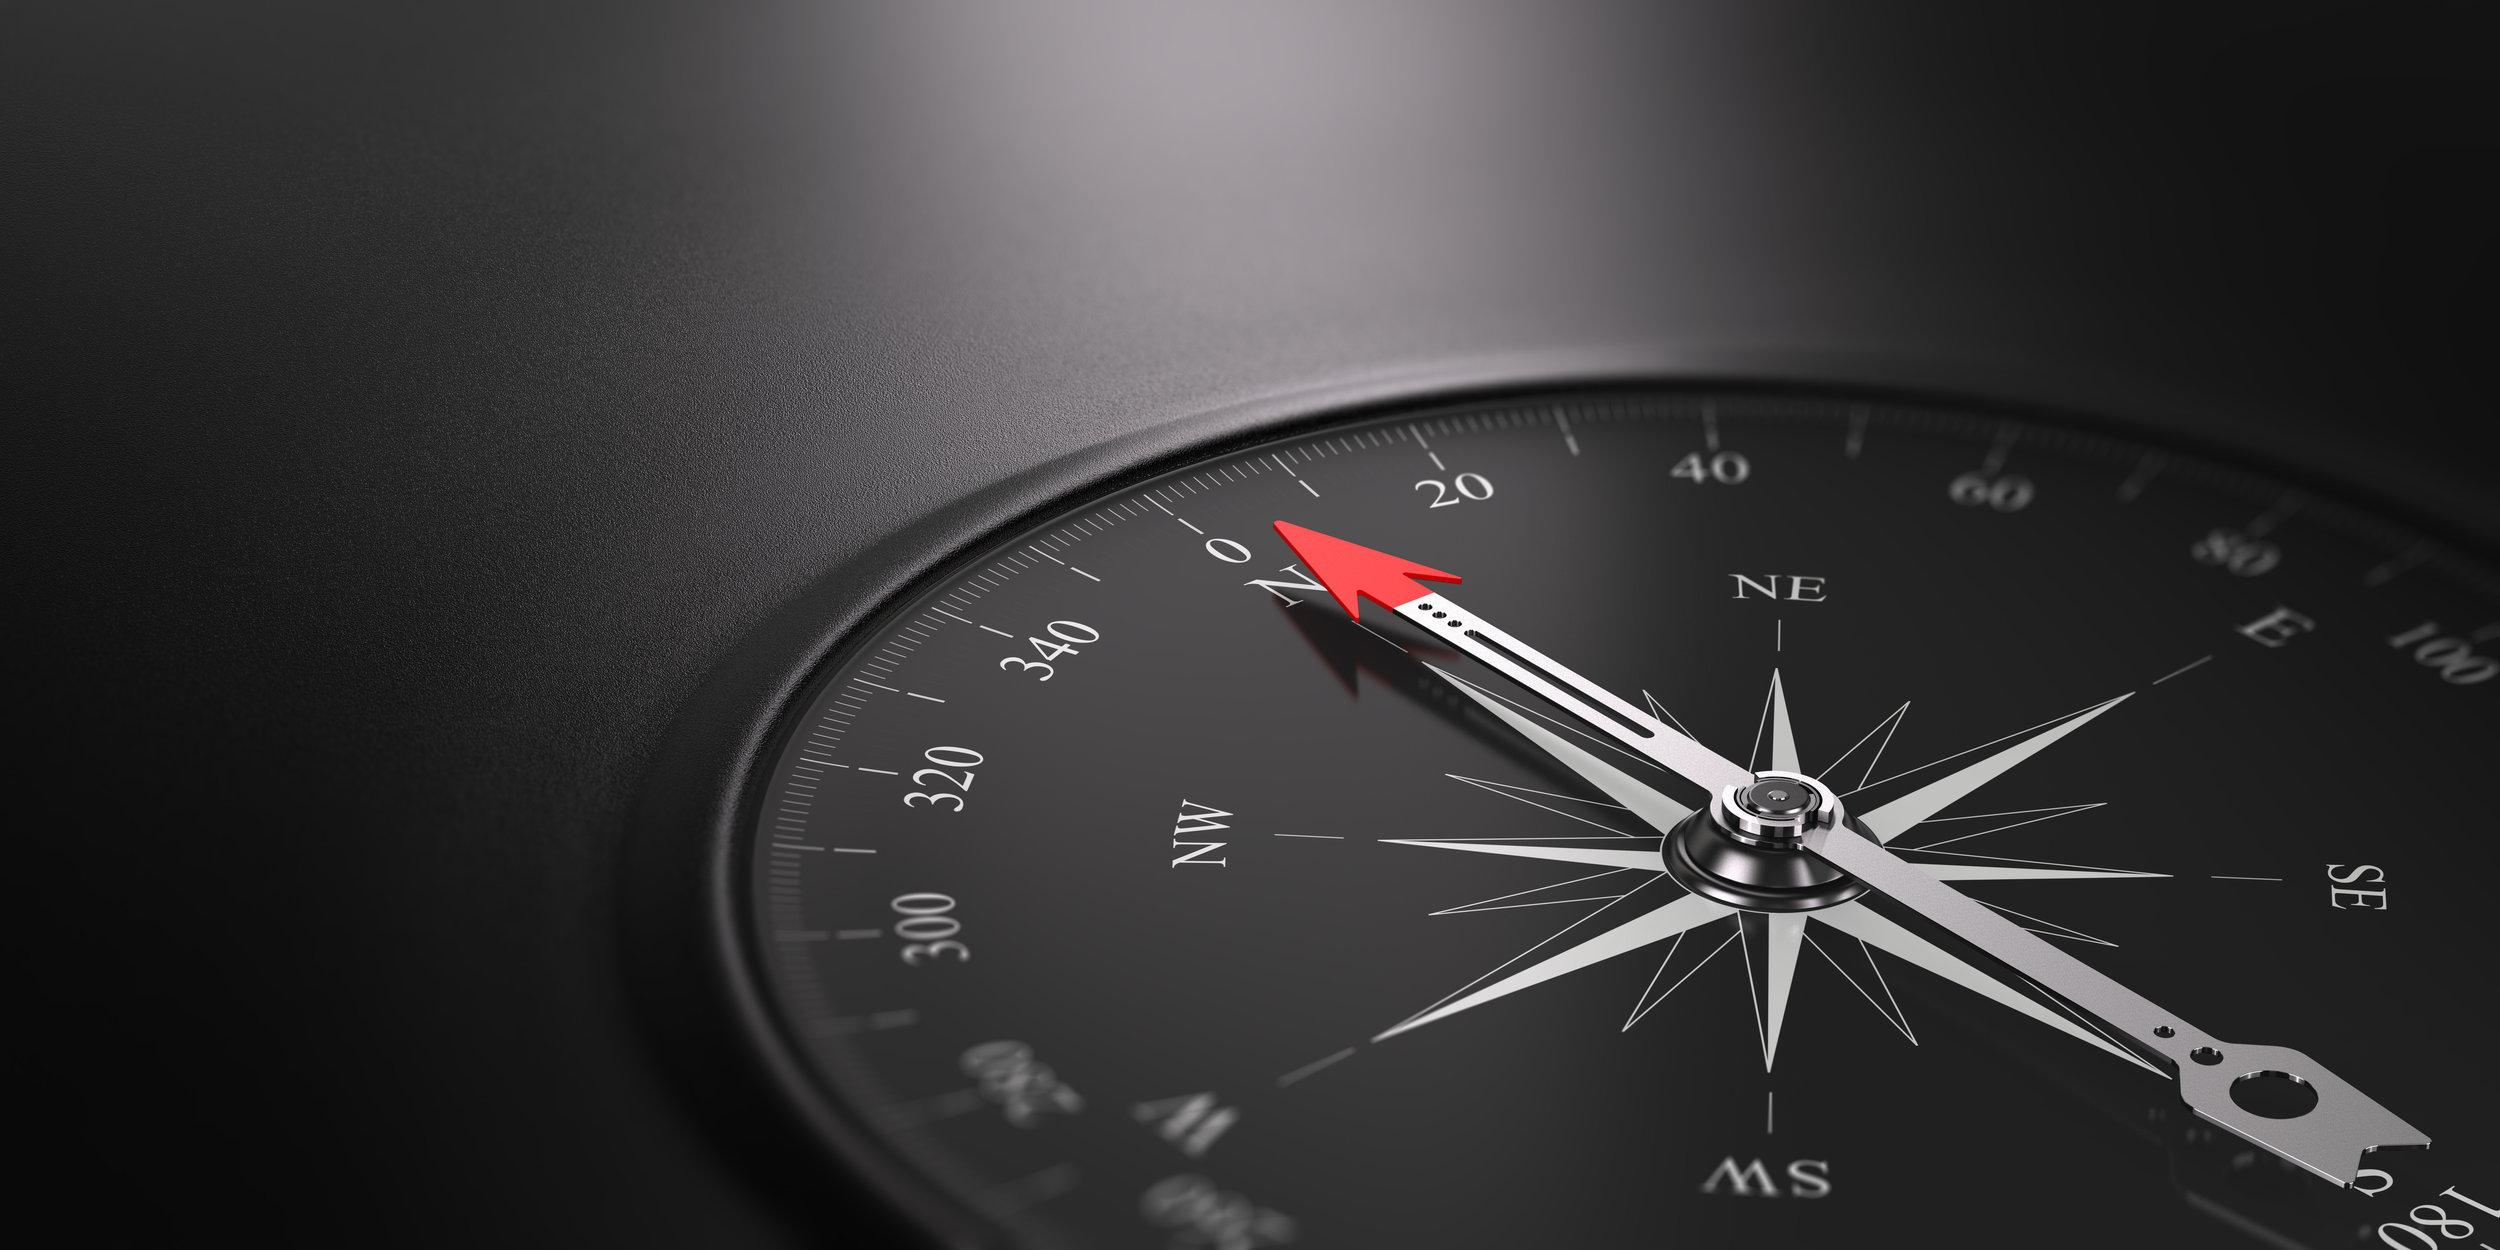 business-orientation-background-compass-on-the-PJBSP2V.jpg